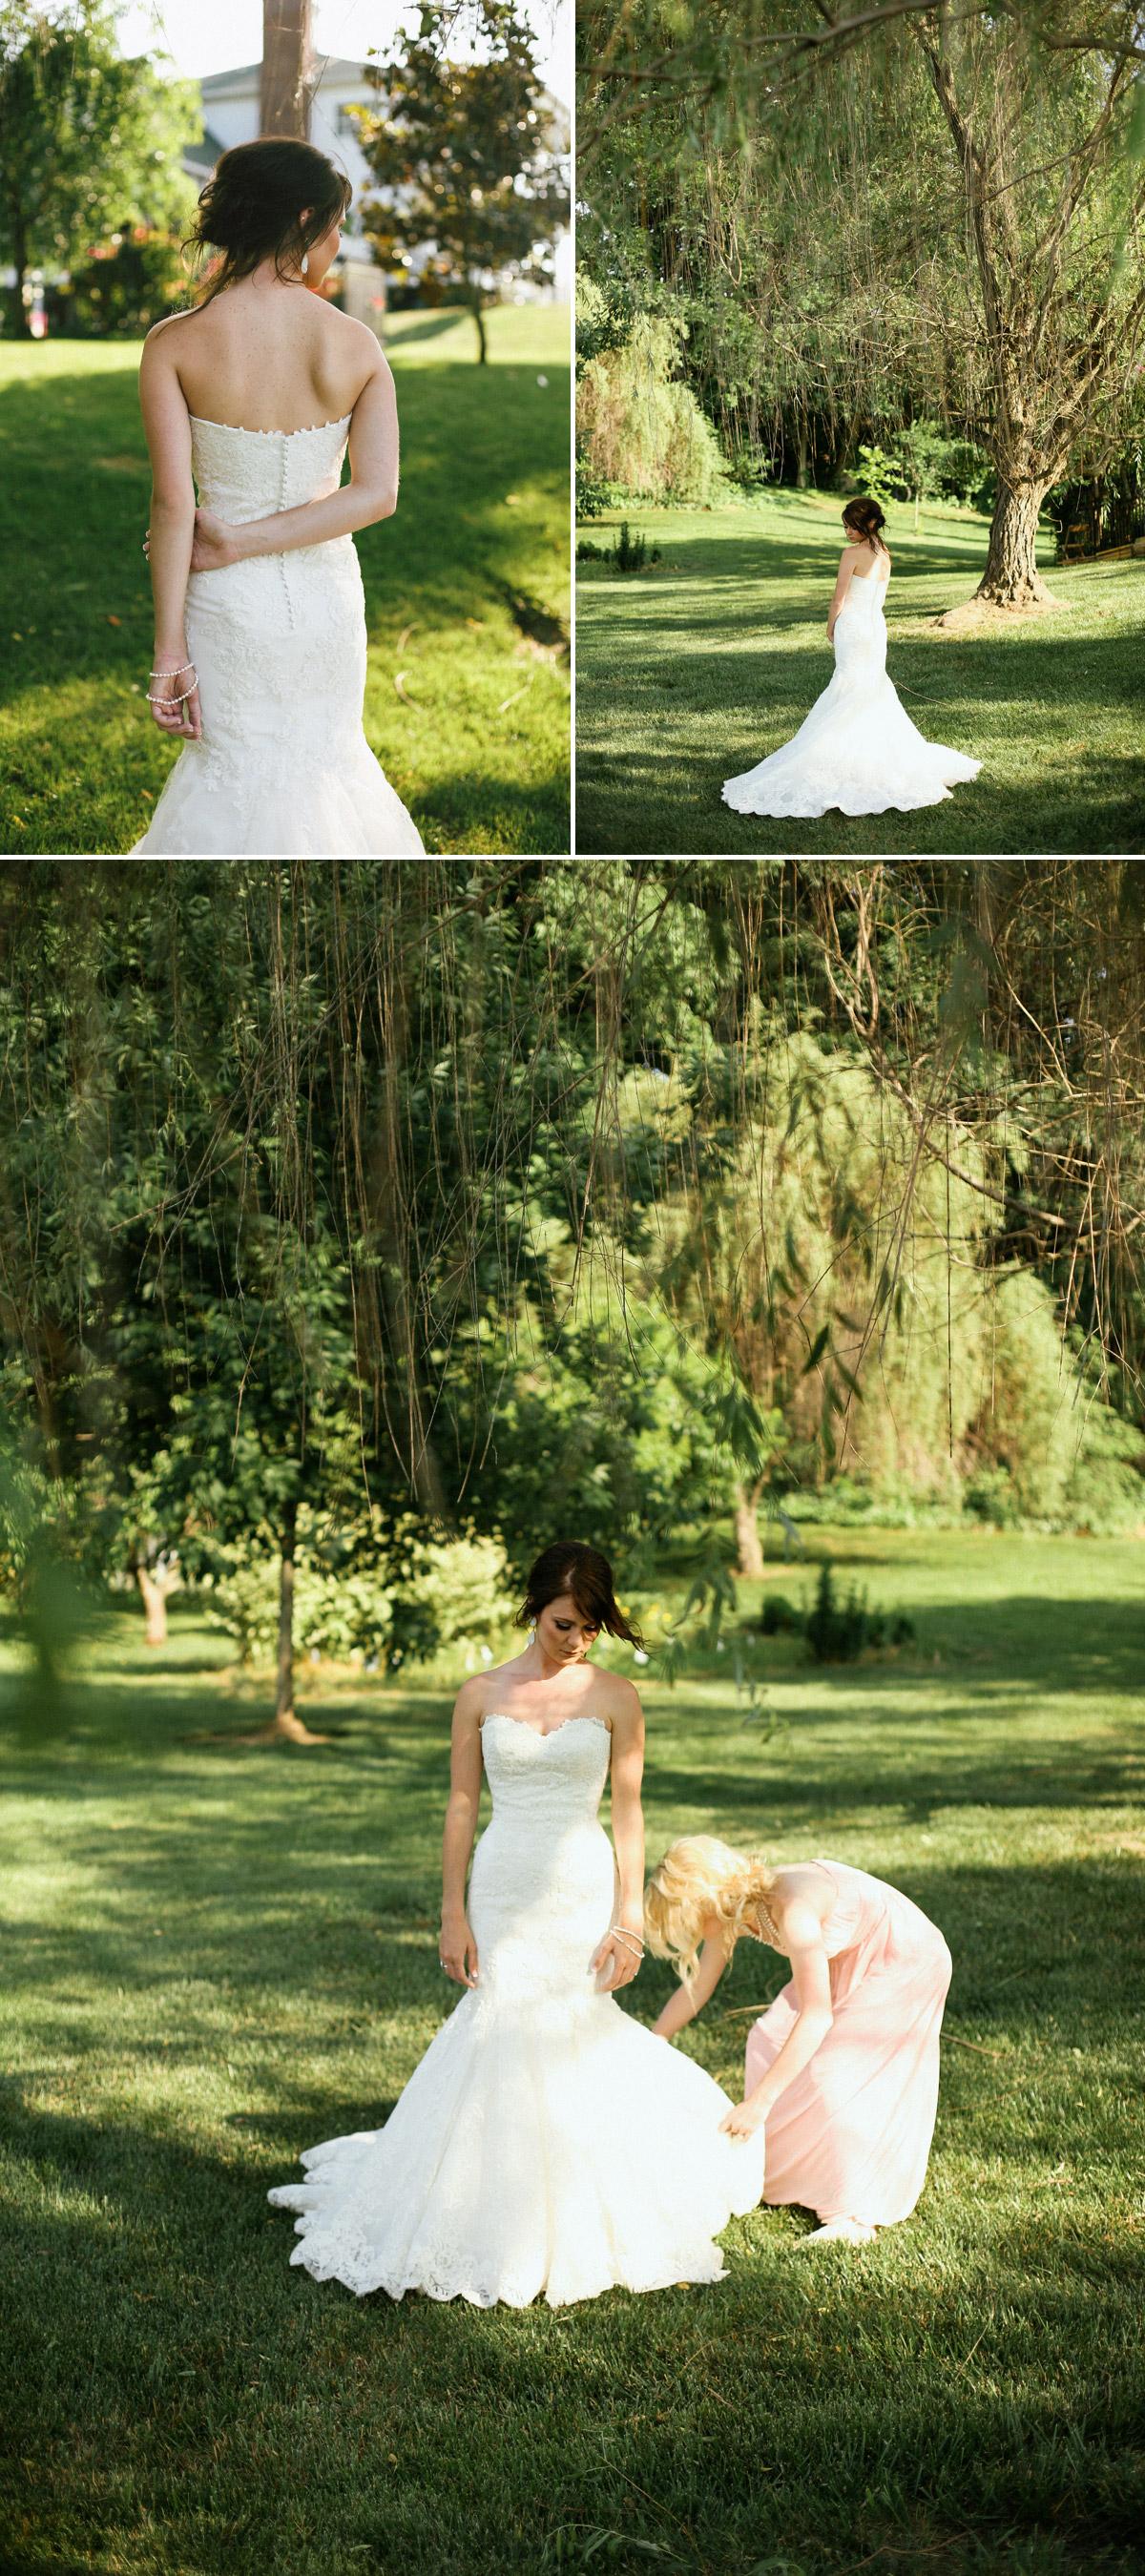 Blog-Collage-1401687608582.jpg